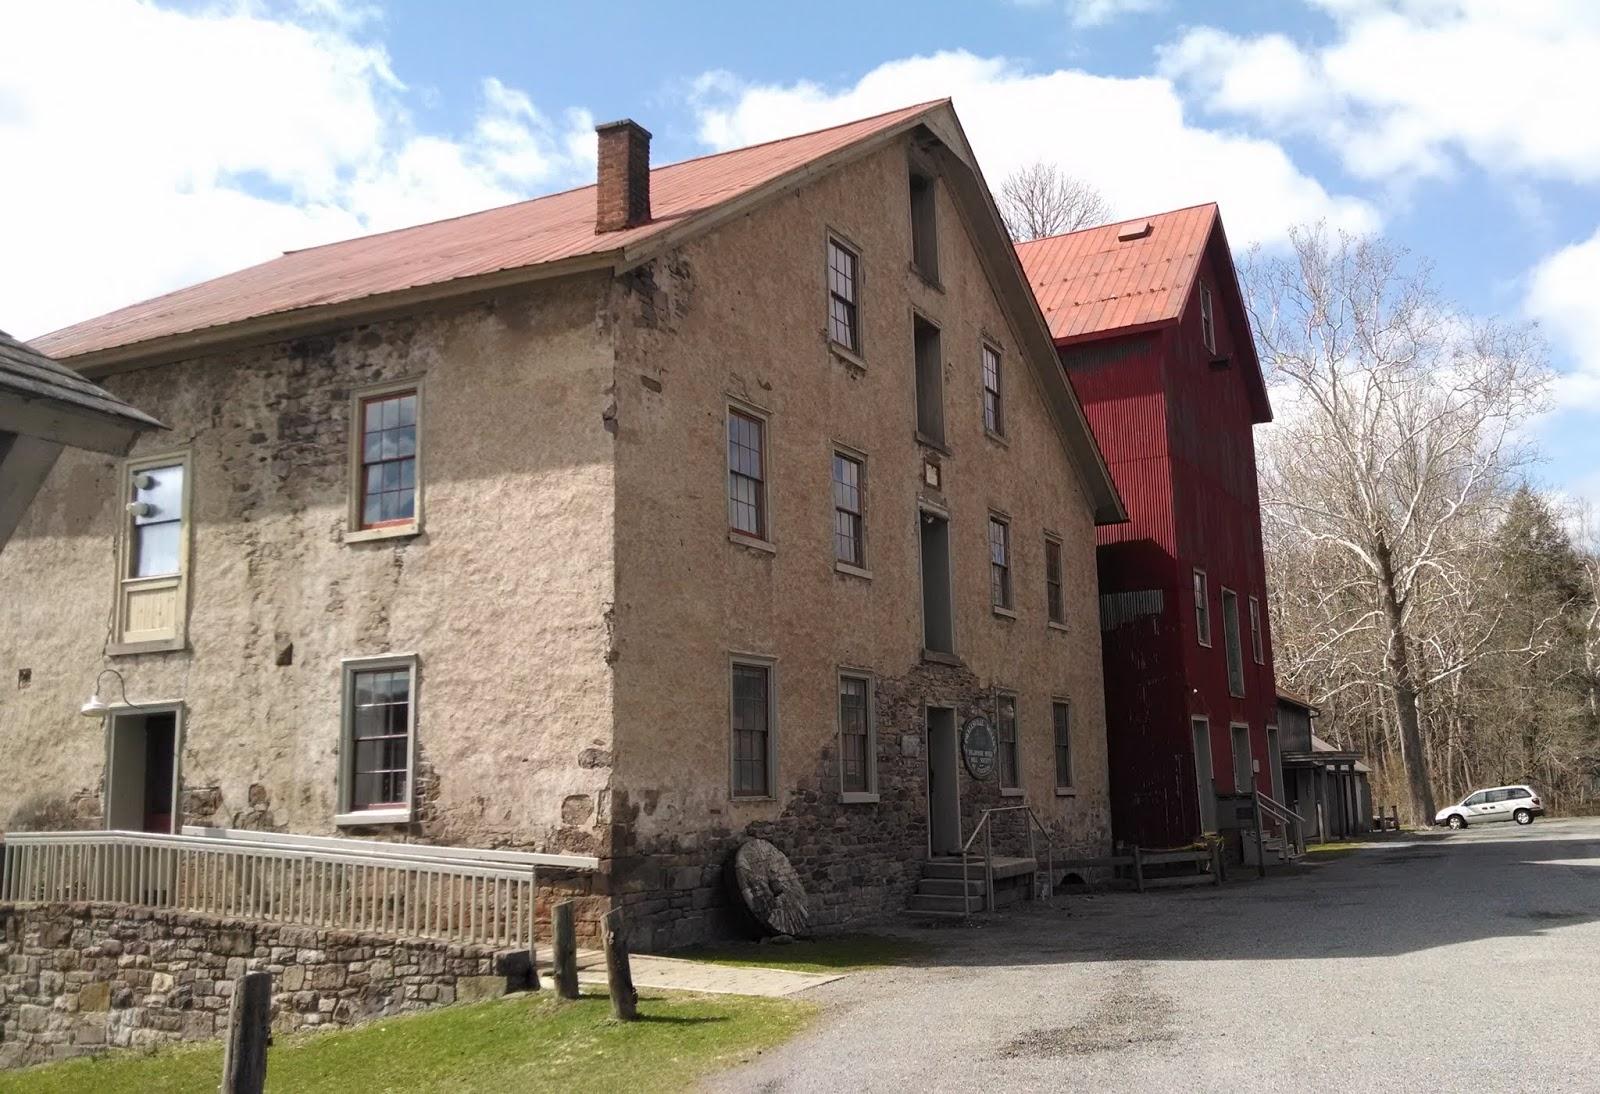 Стоктон, Нью Джерси (Prallsville Grist Mill, Stockton, NJ)